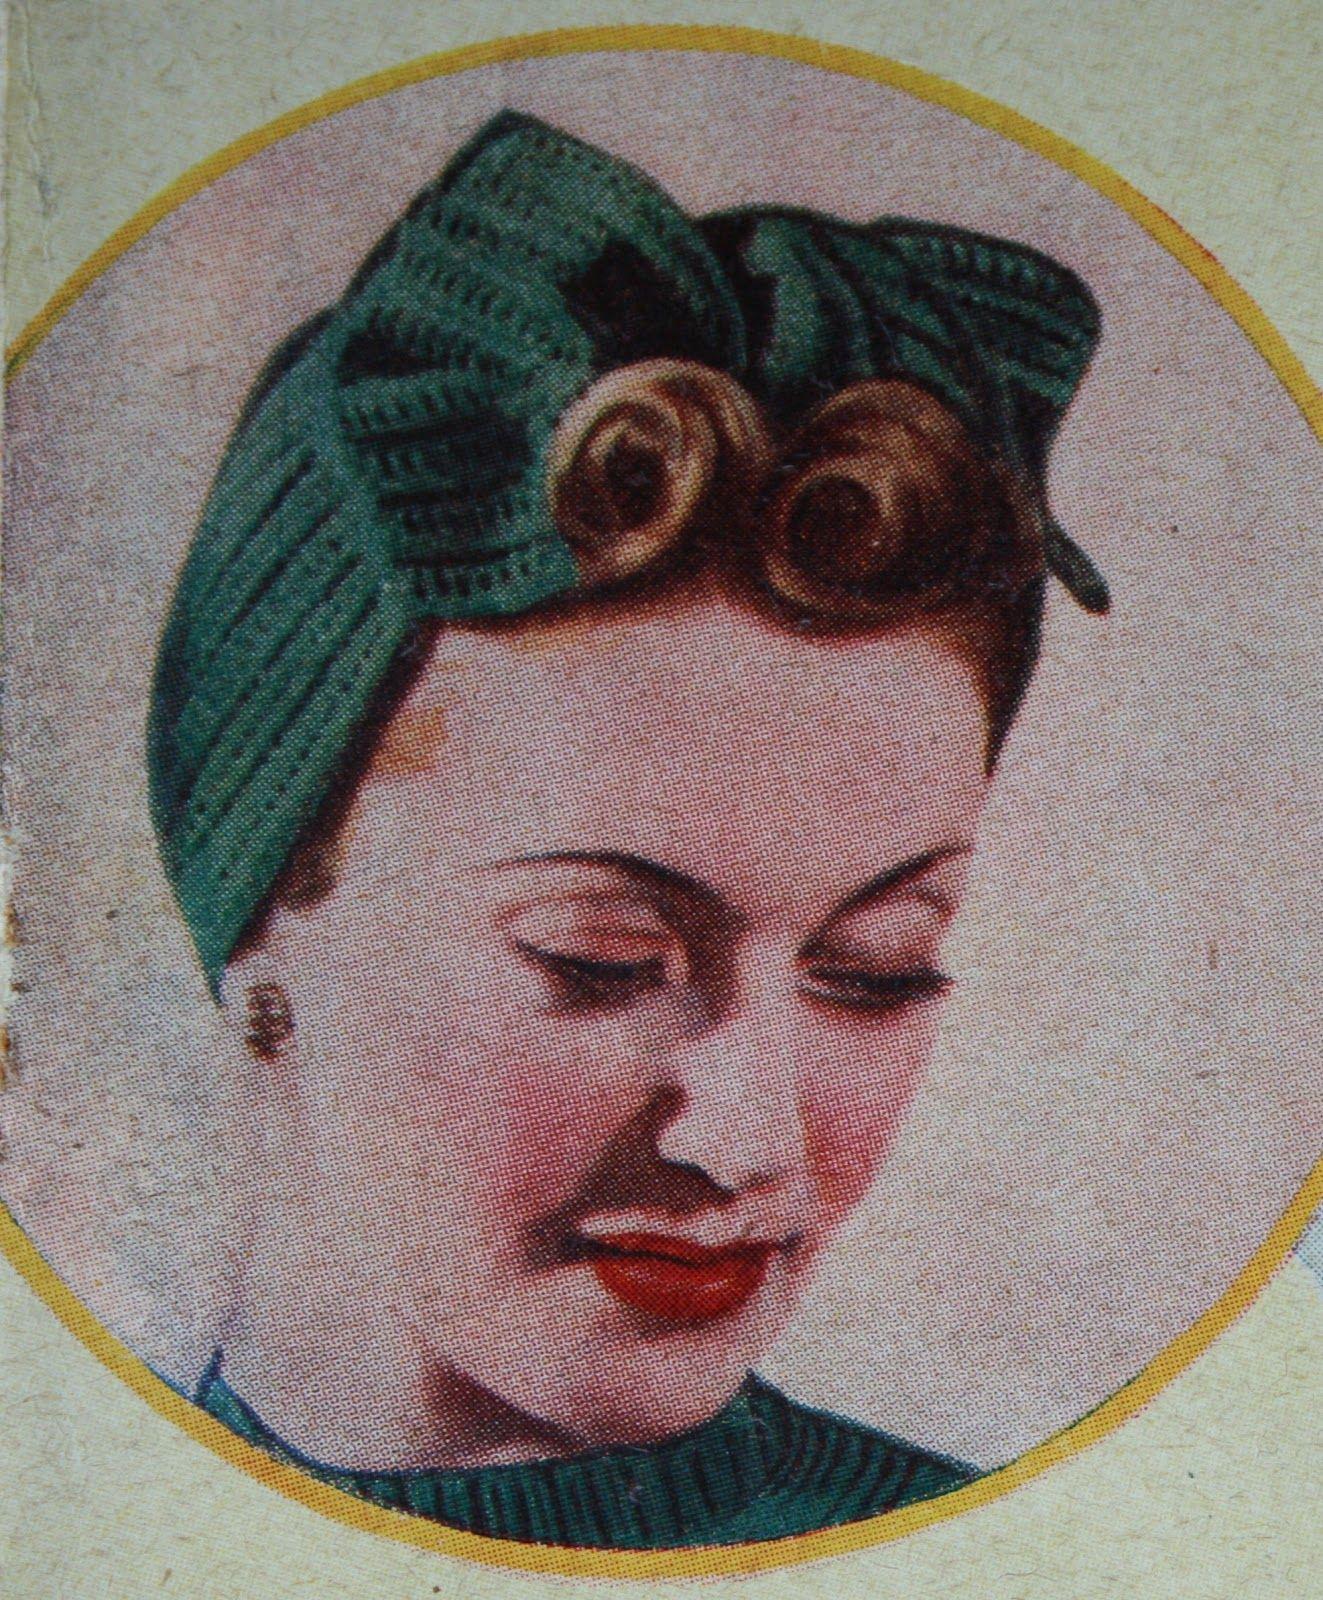 Pin de Pin Up Candy en Vintage ski clothing | Pinterest